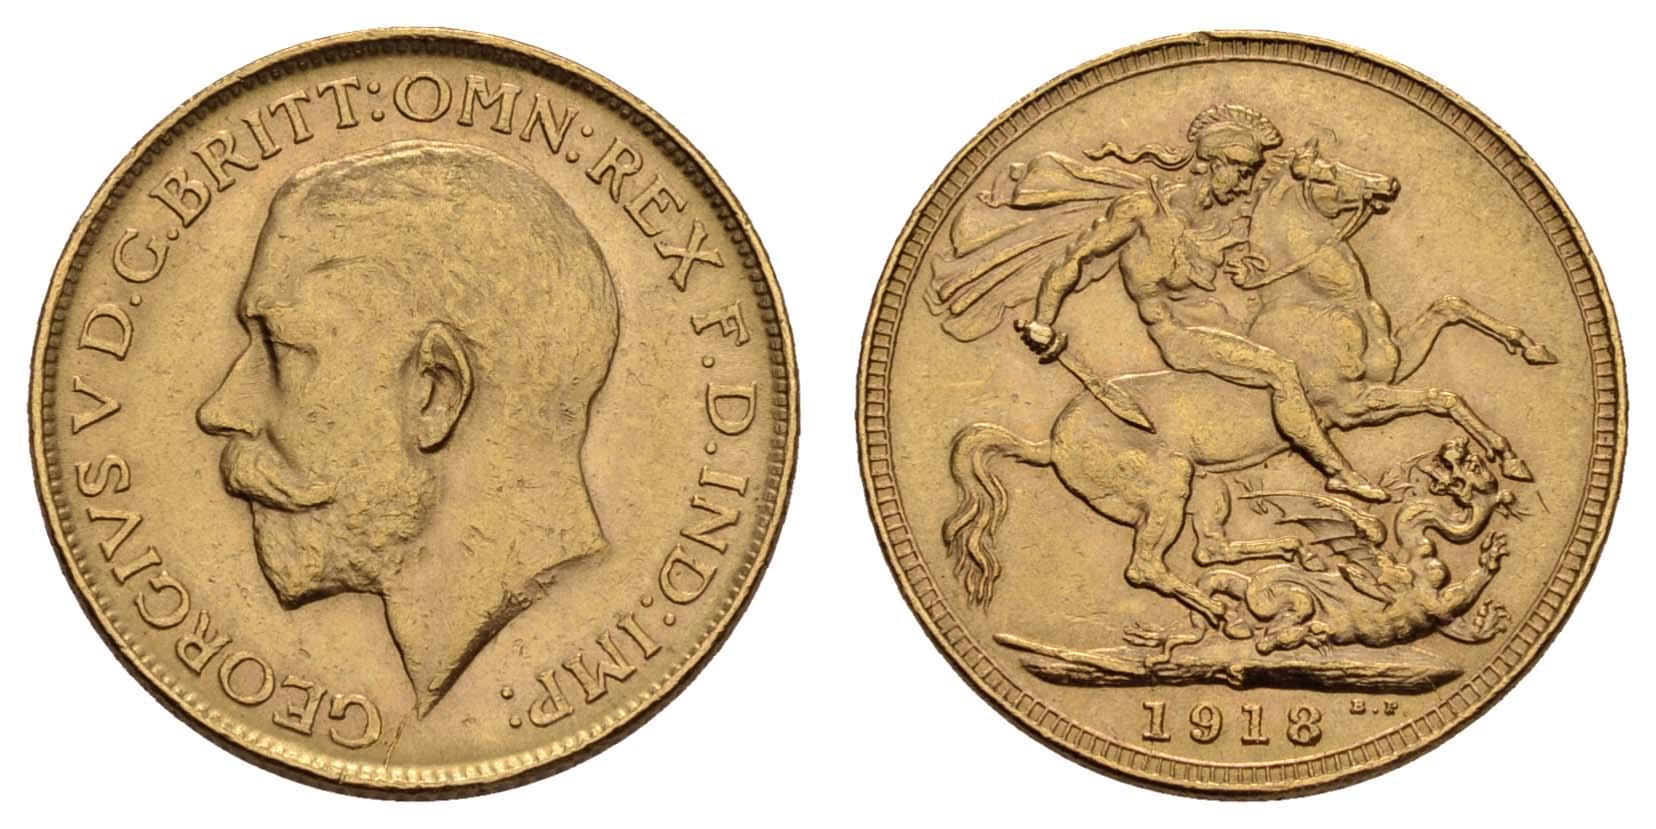 Lot 1862 - übersee australien -  Auktionshaus Ulrich Felzmann GmbH & Co. KG Coins single lots